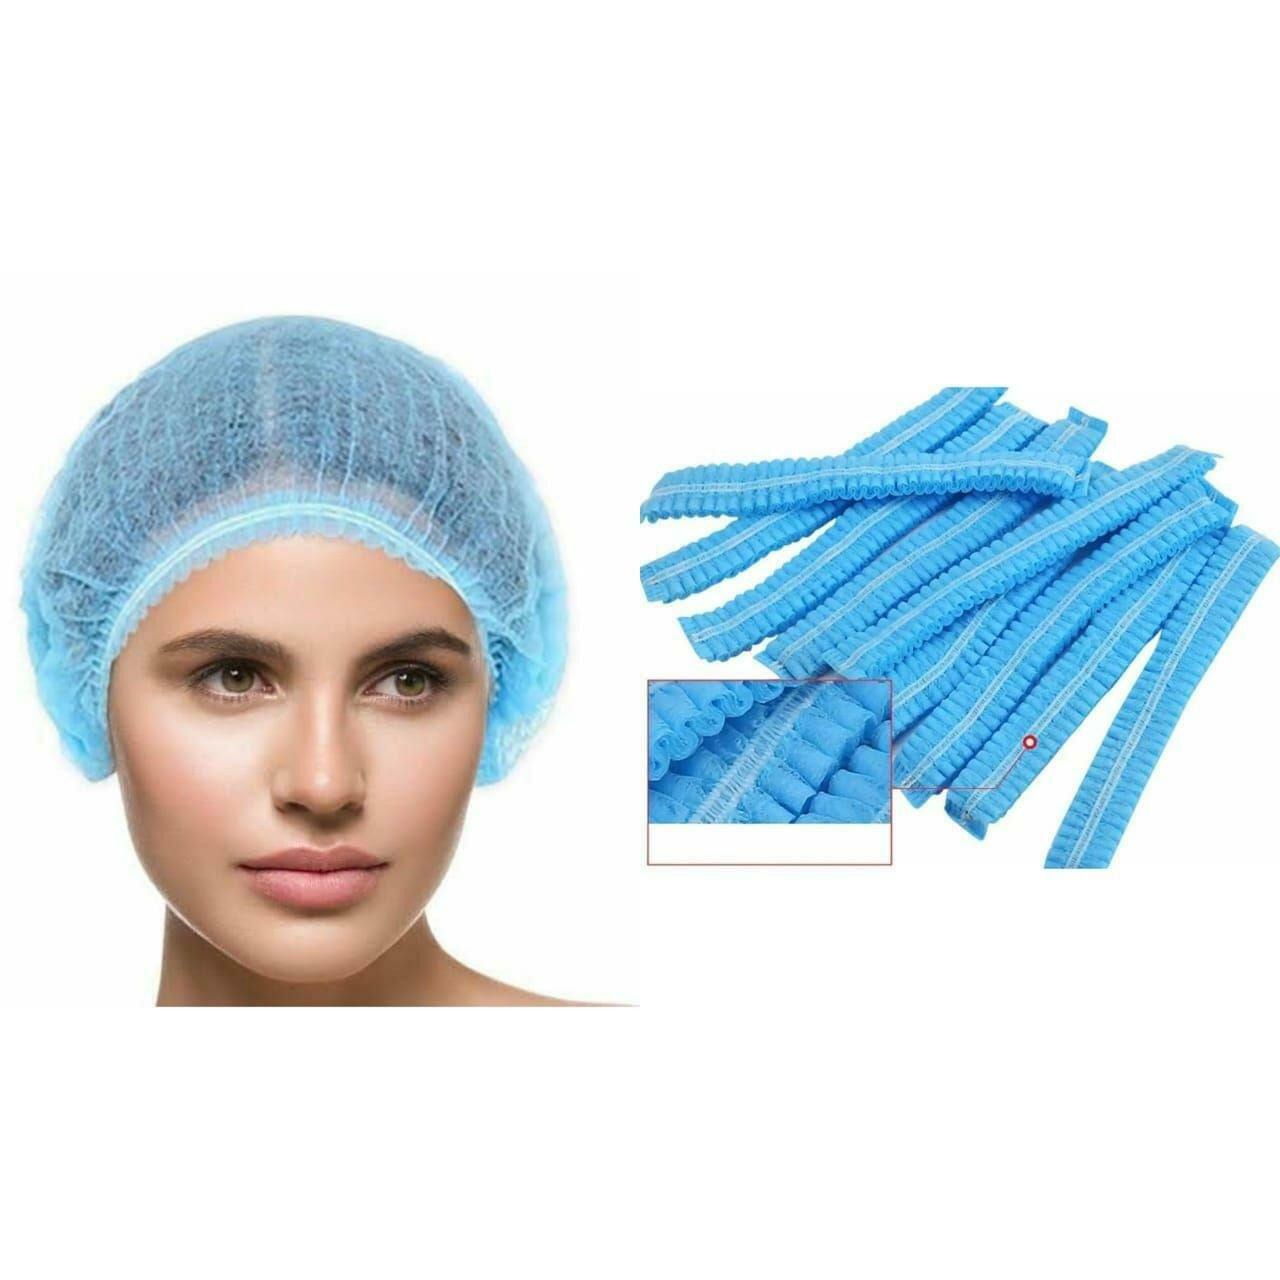 SURGICAL HEAD CAP